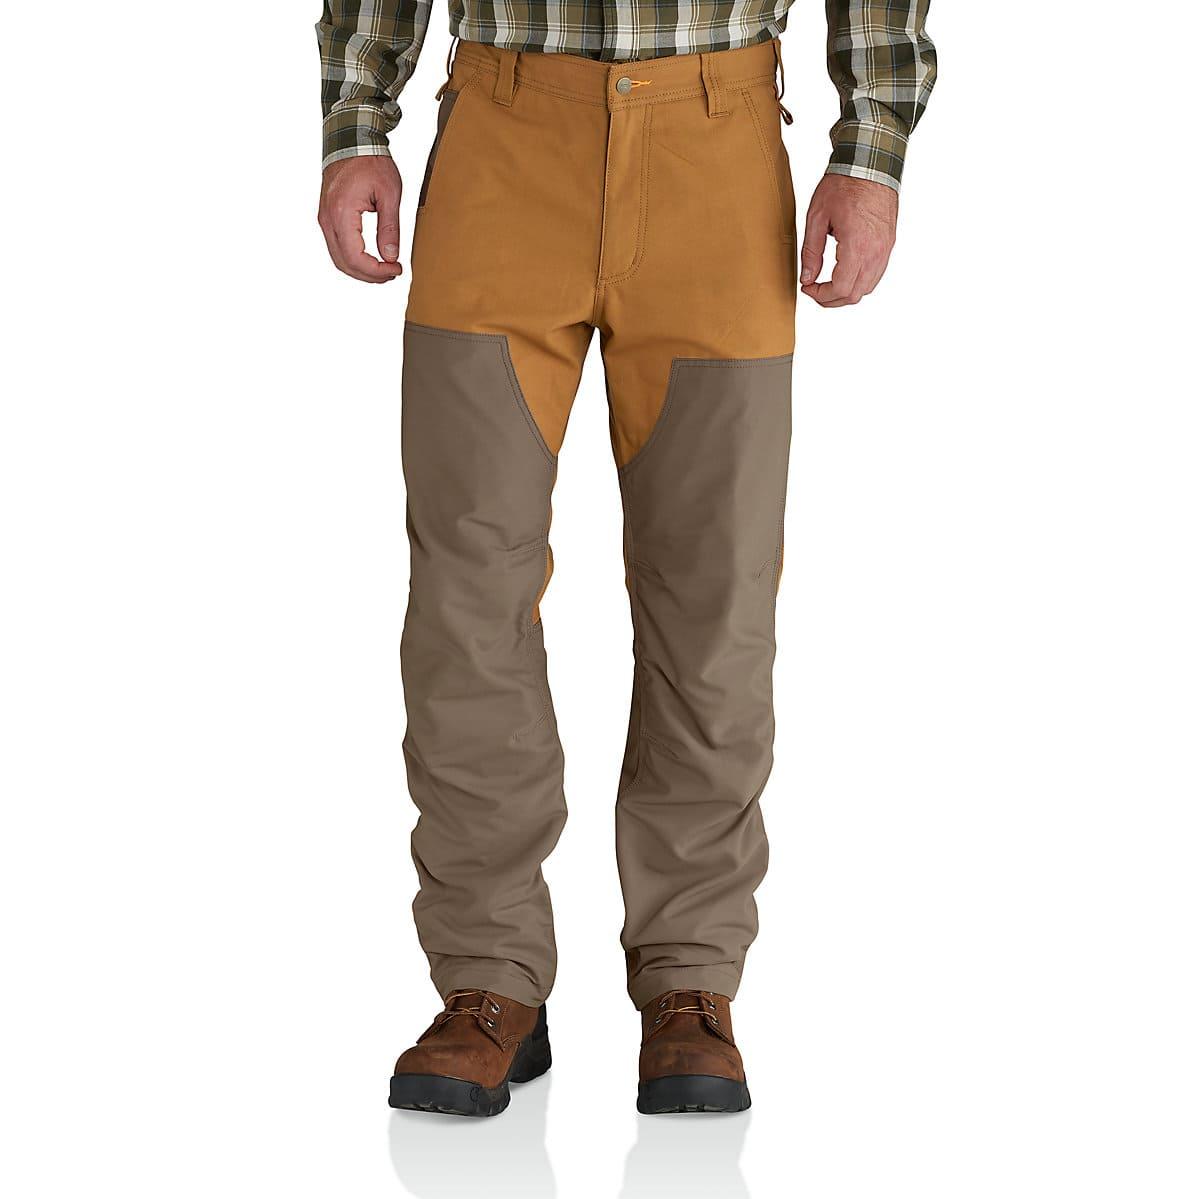 b59dad9607f36 Men's Upland Field Pant 102282 | Carhartt